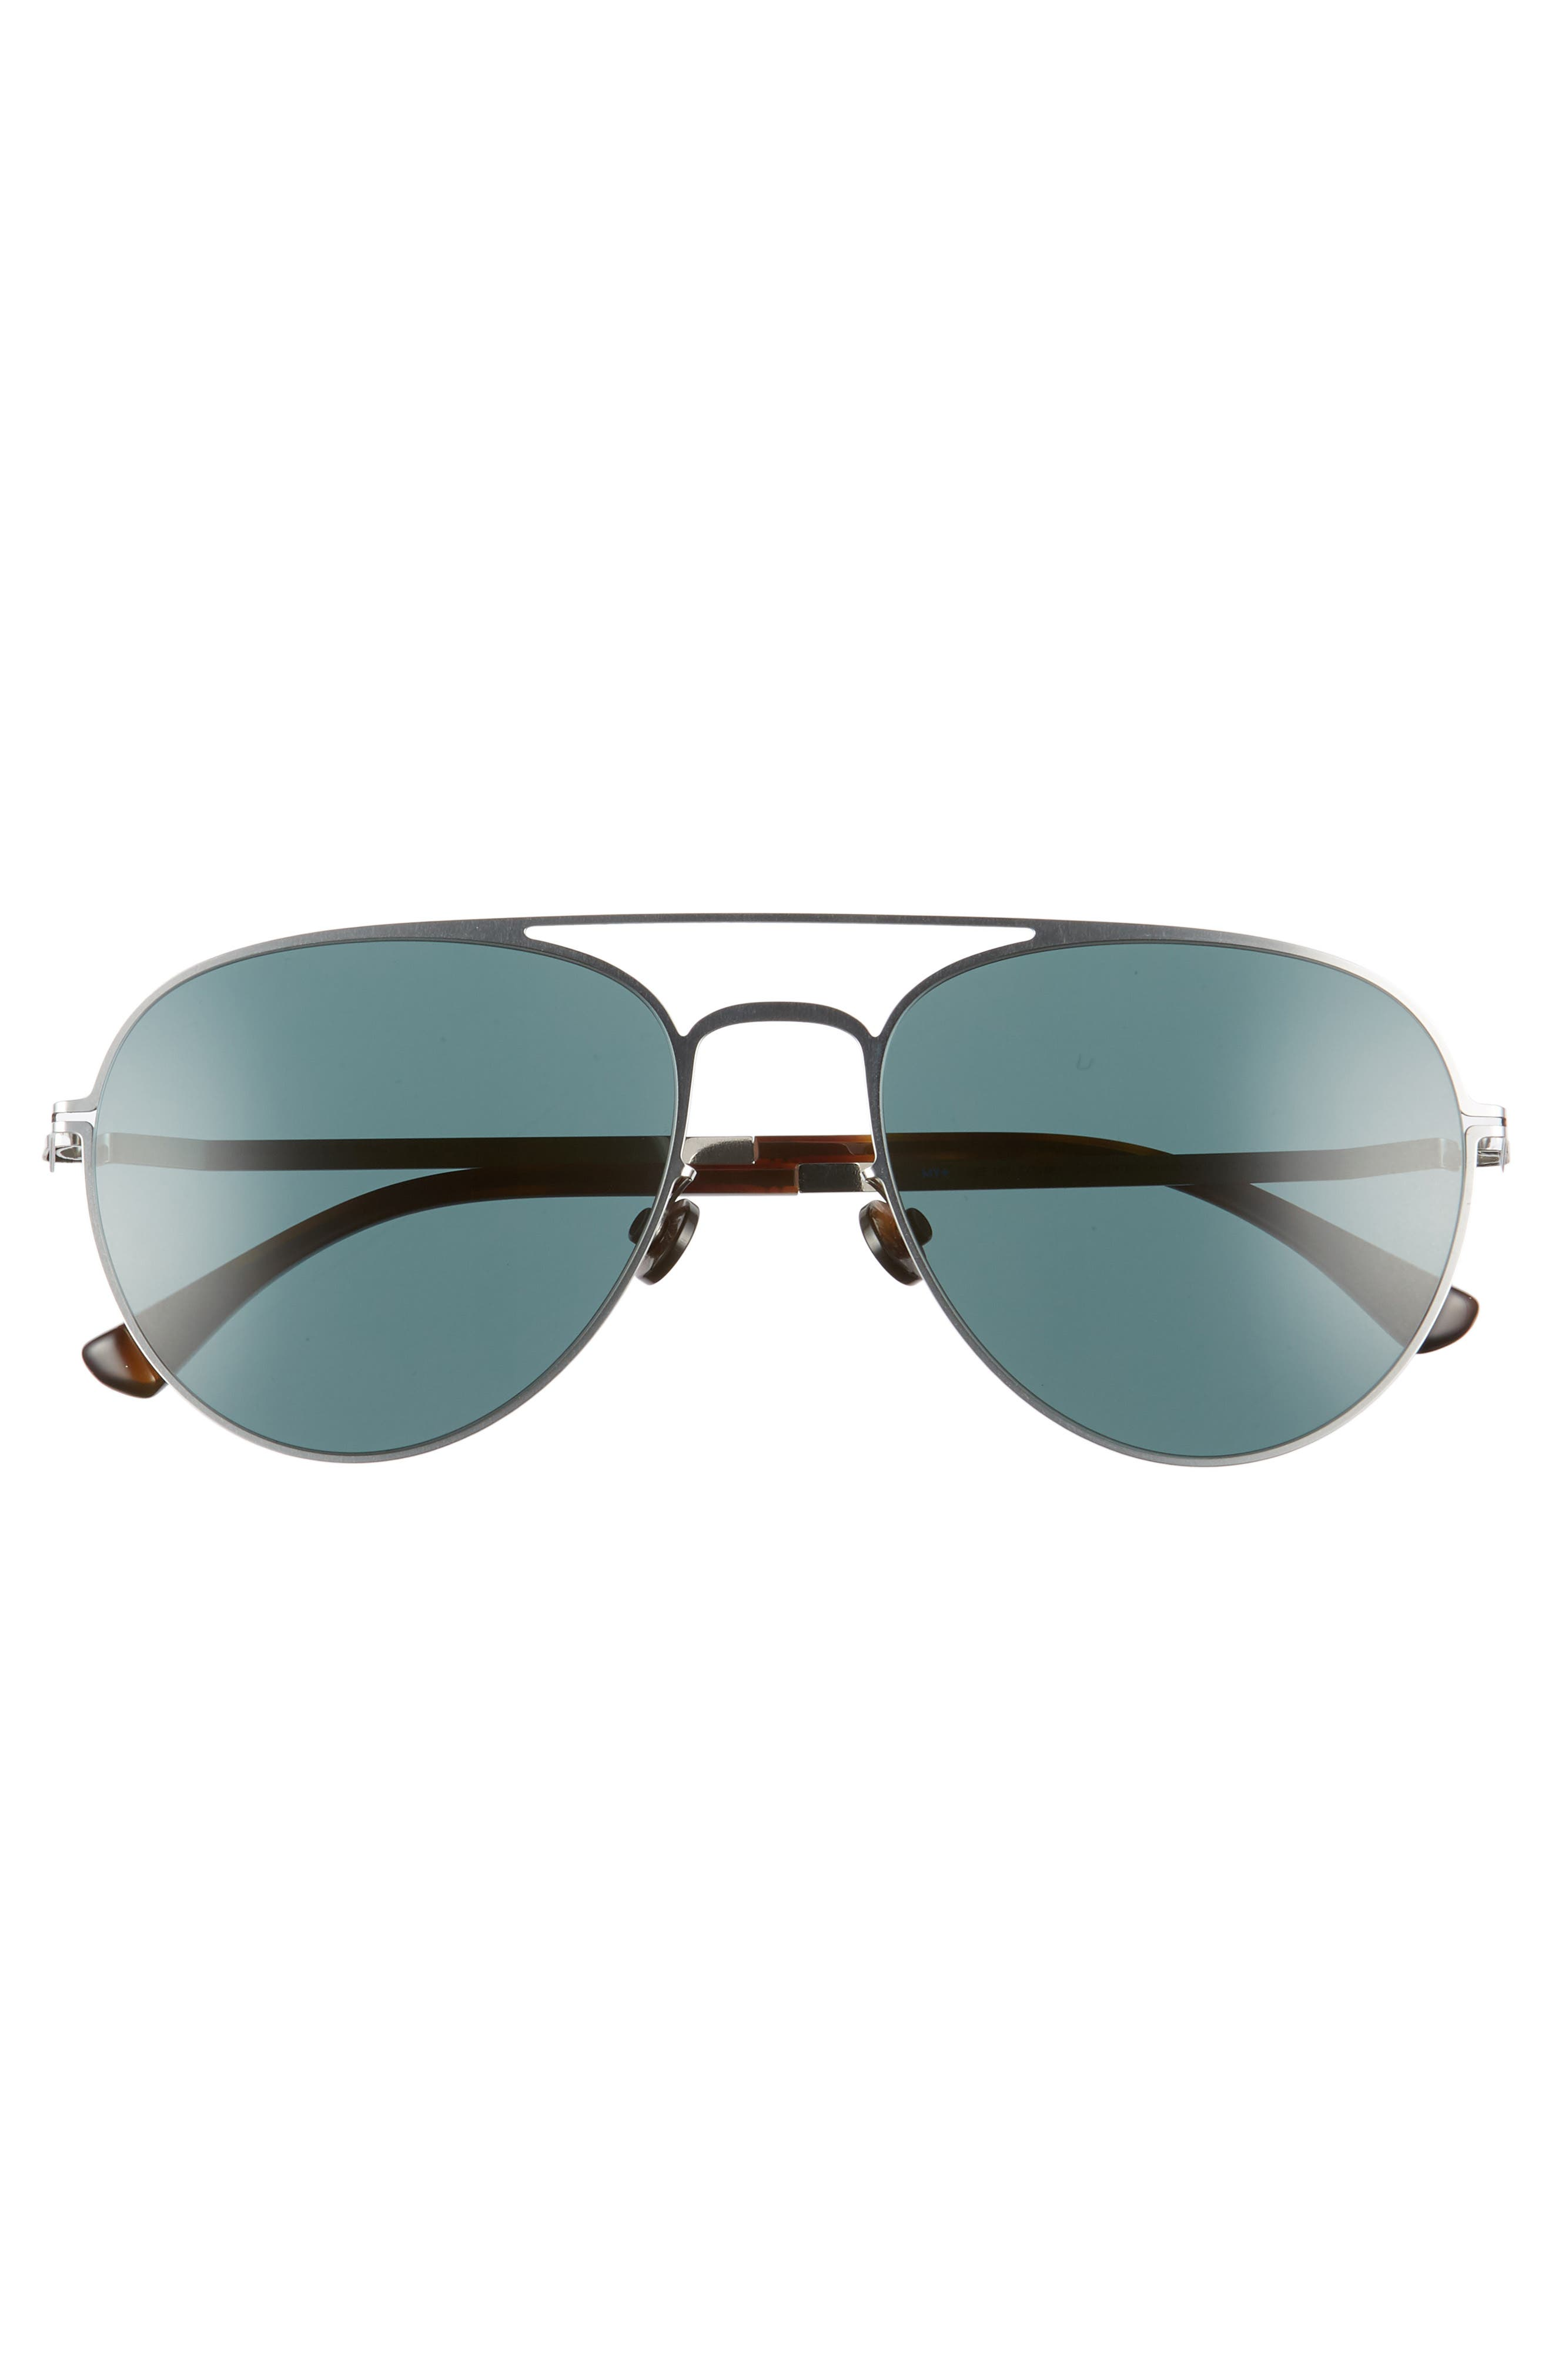 Samu 55mm Polarized Aviator Sunglasses,                             Alternate thumbnail 4, color,